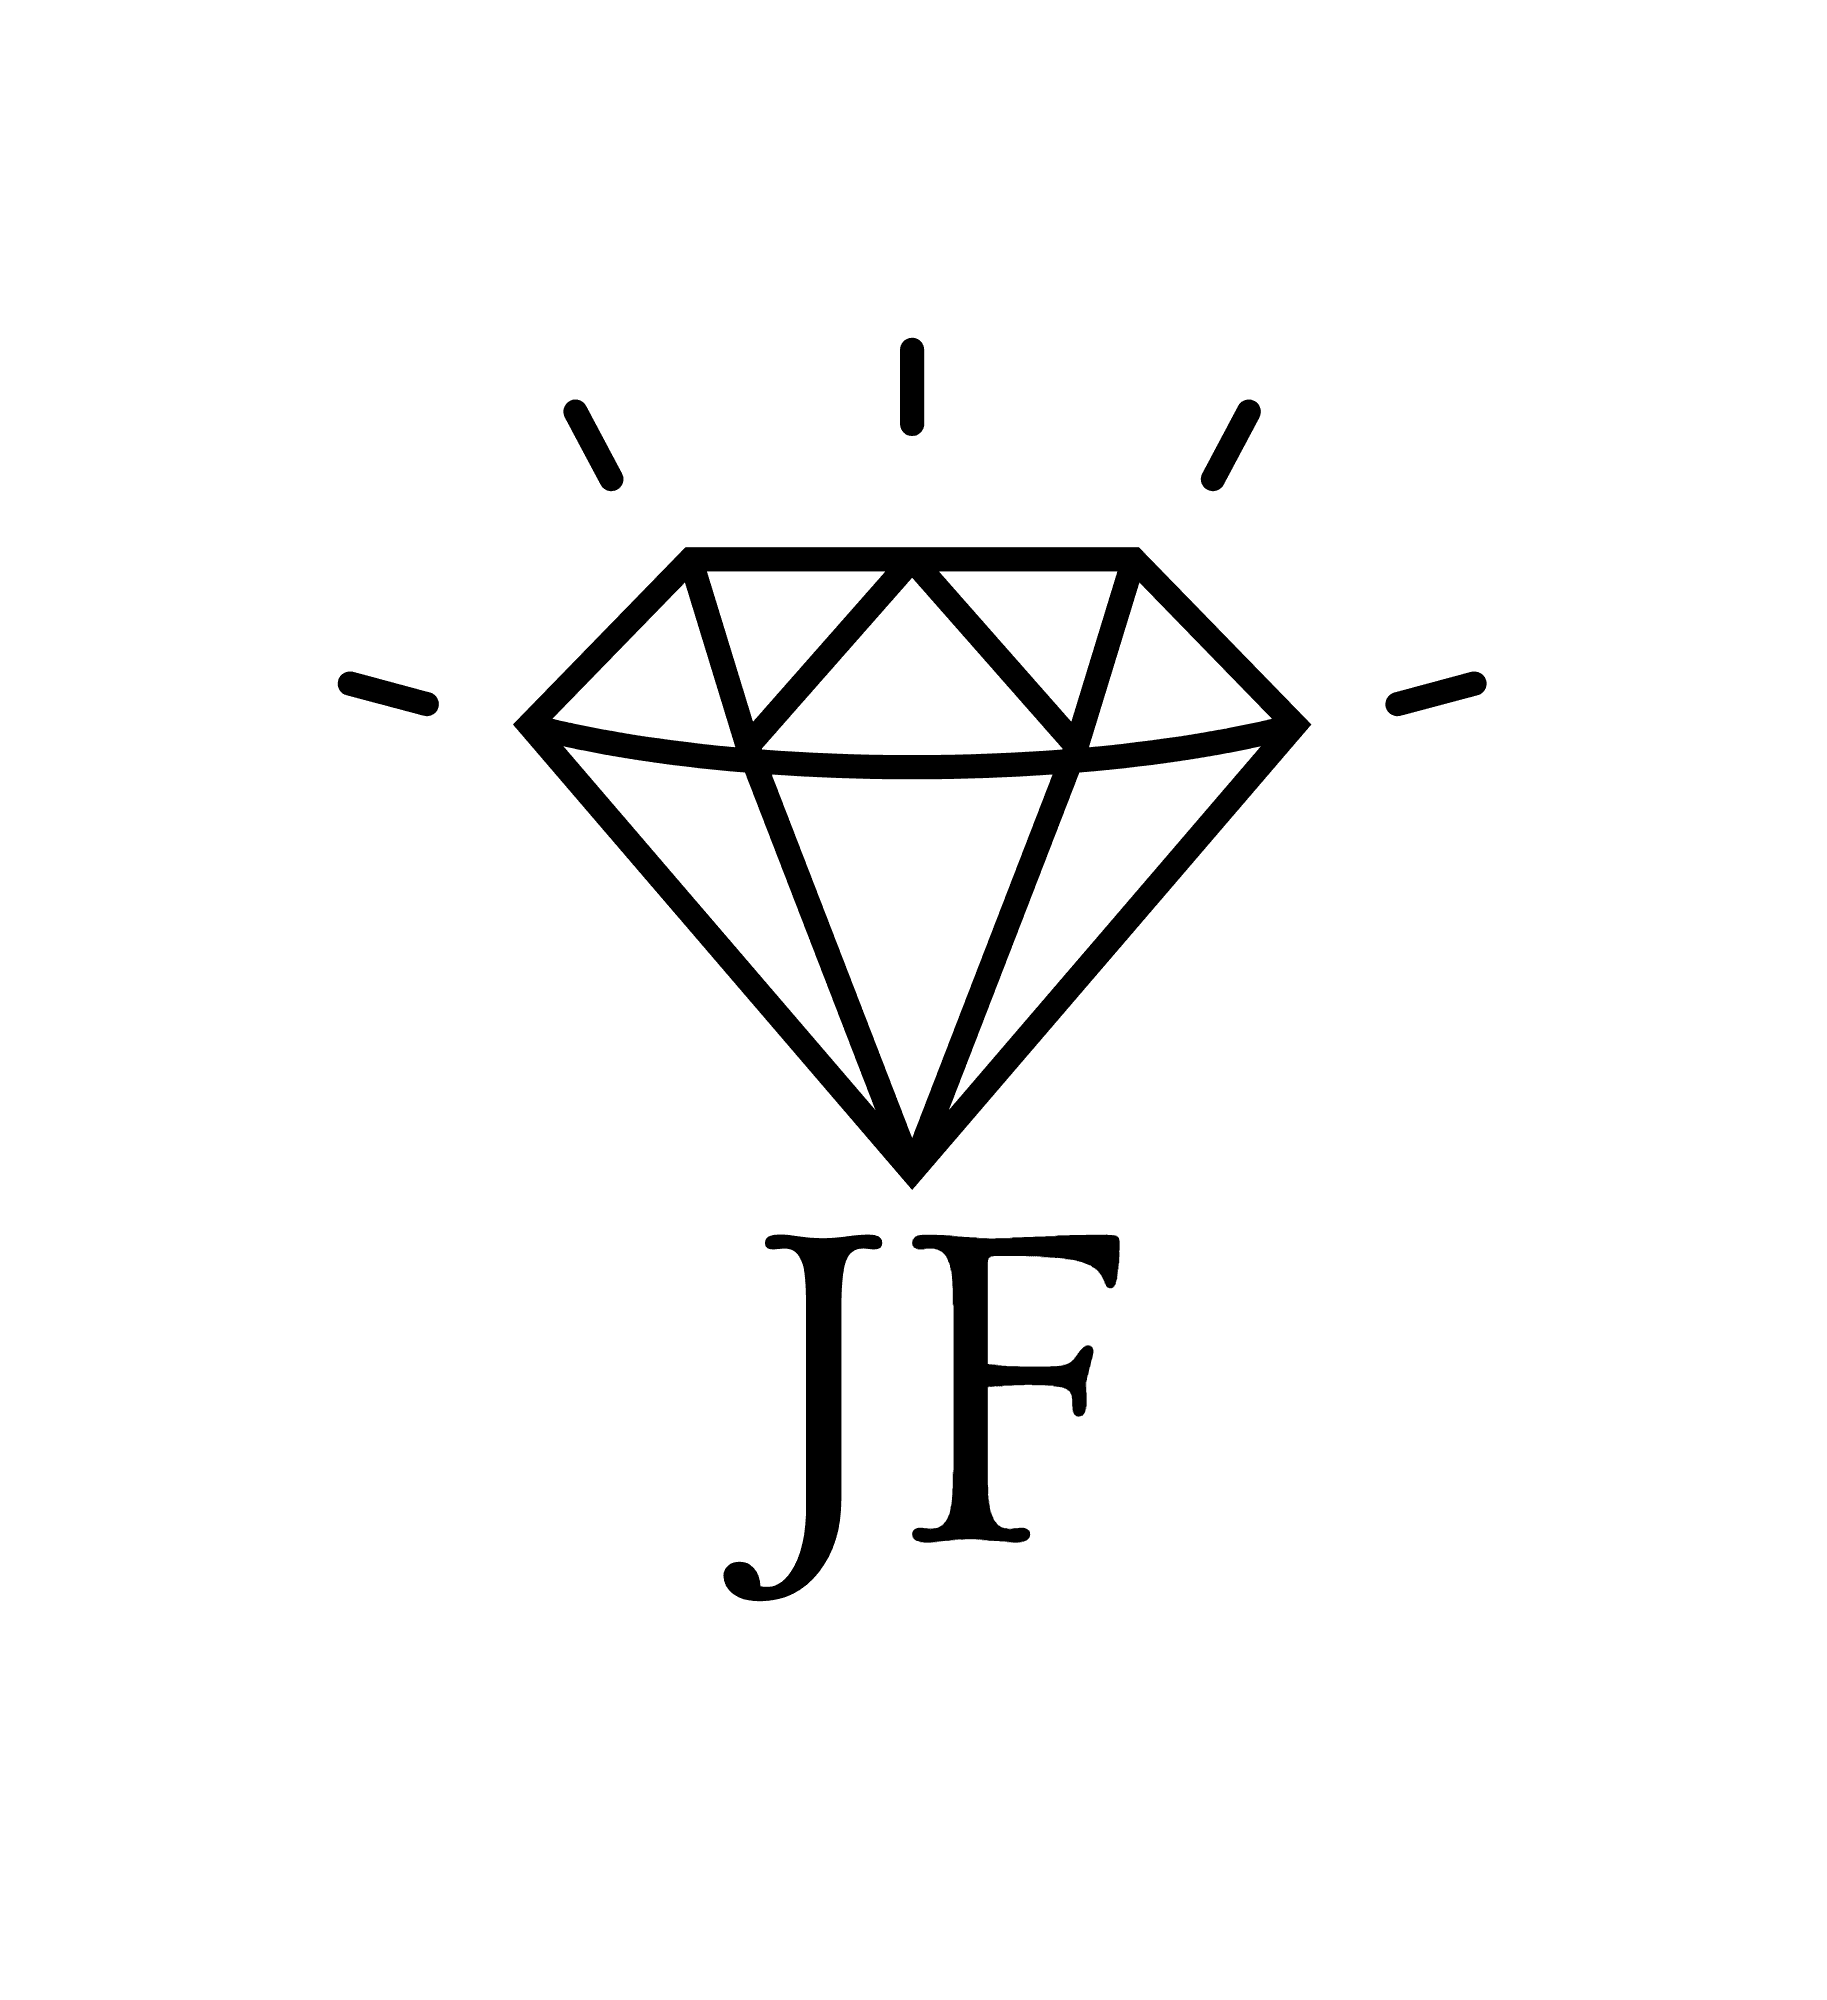 JF-logosmall1.png